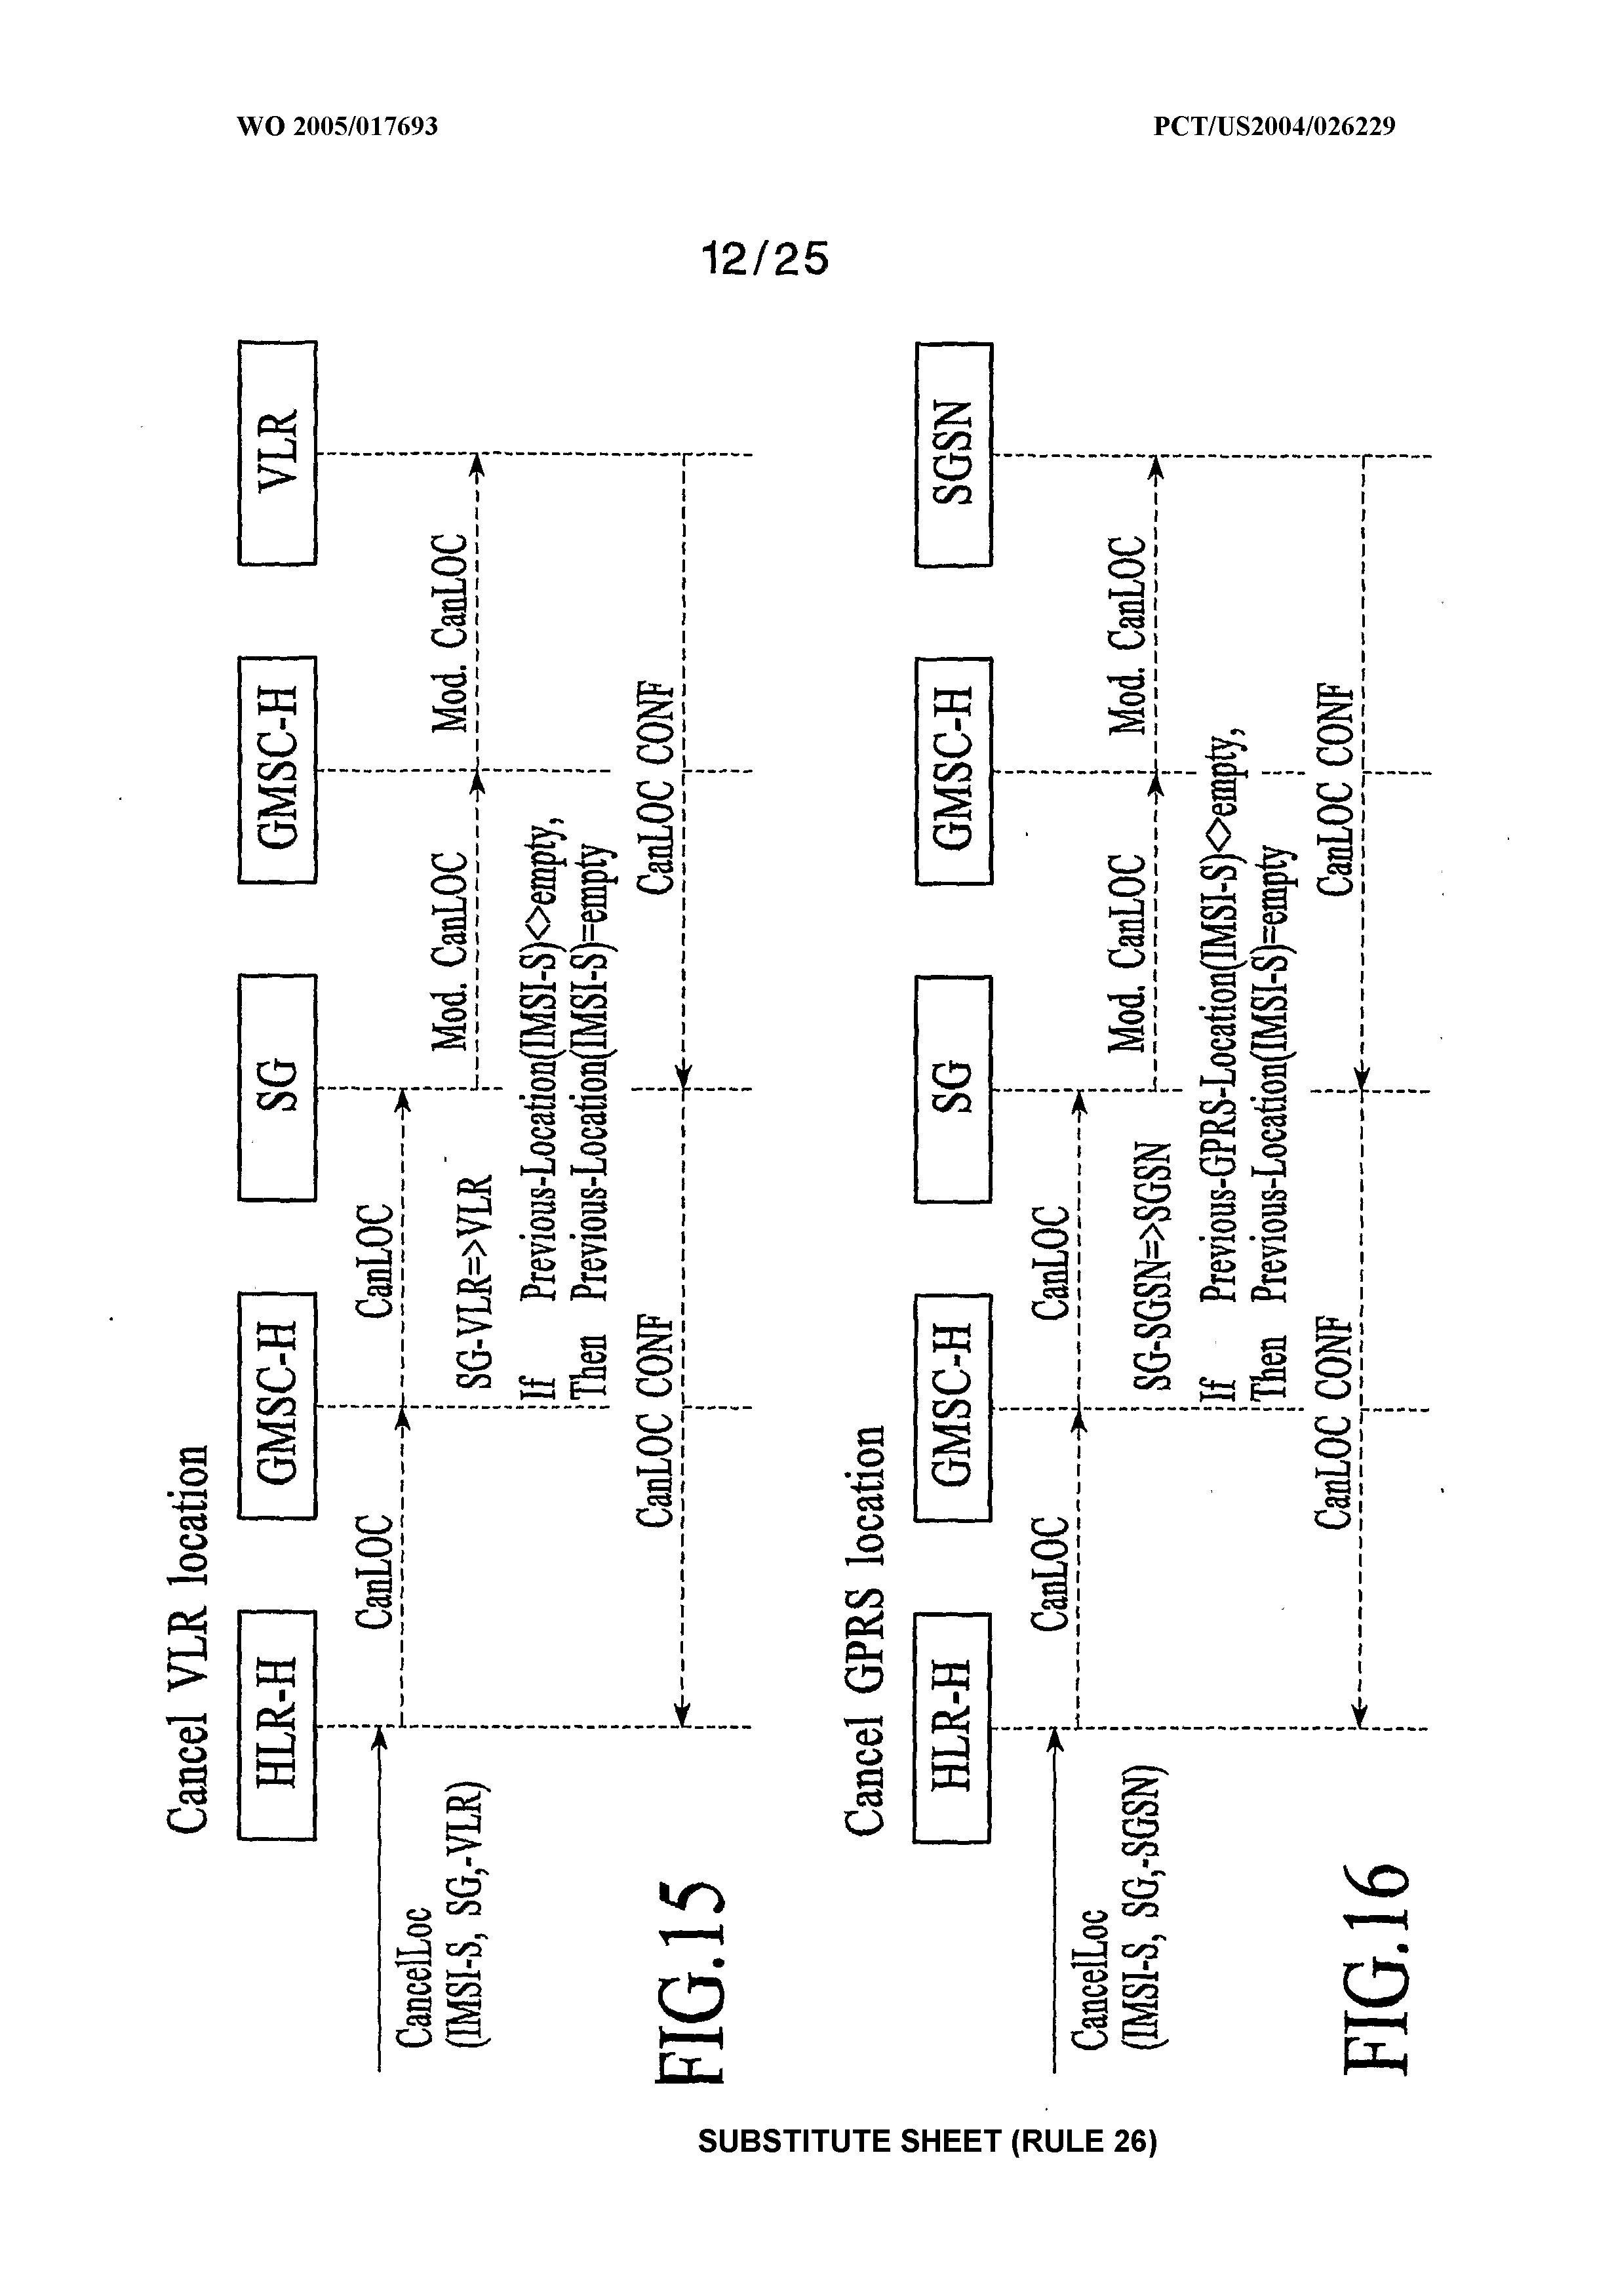 WO 2005/017693 A2 - Multiple Imsi Multiple/single Msisdn